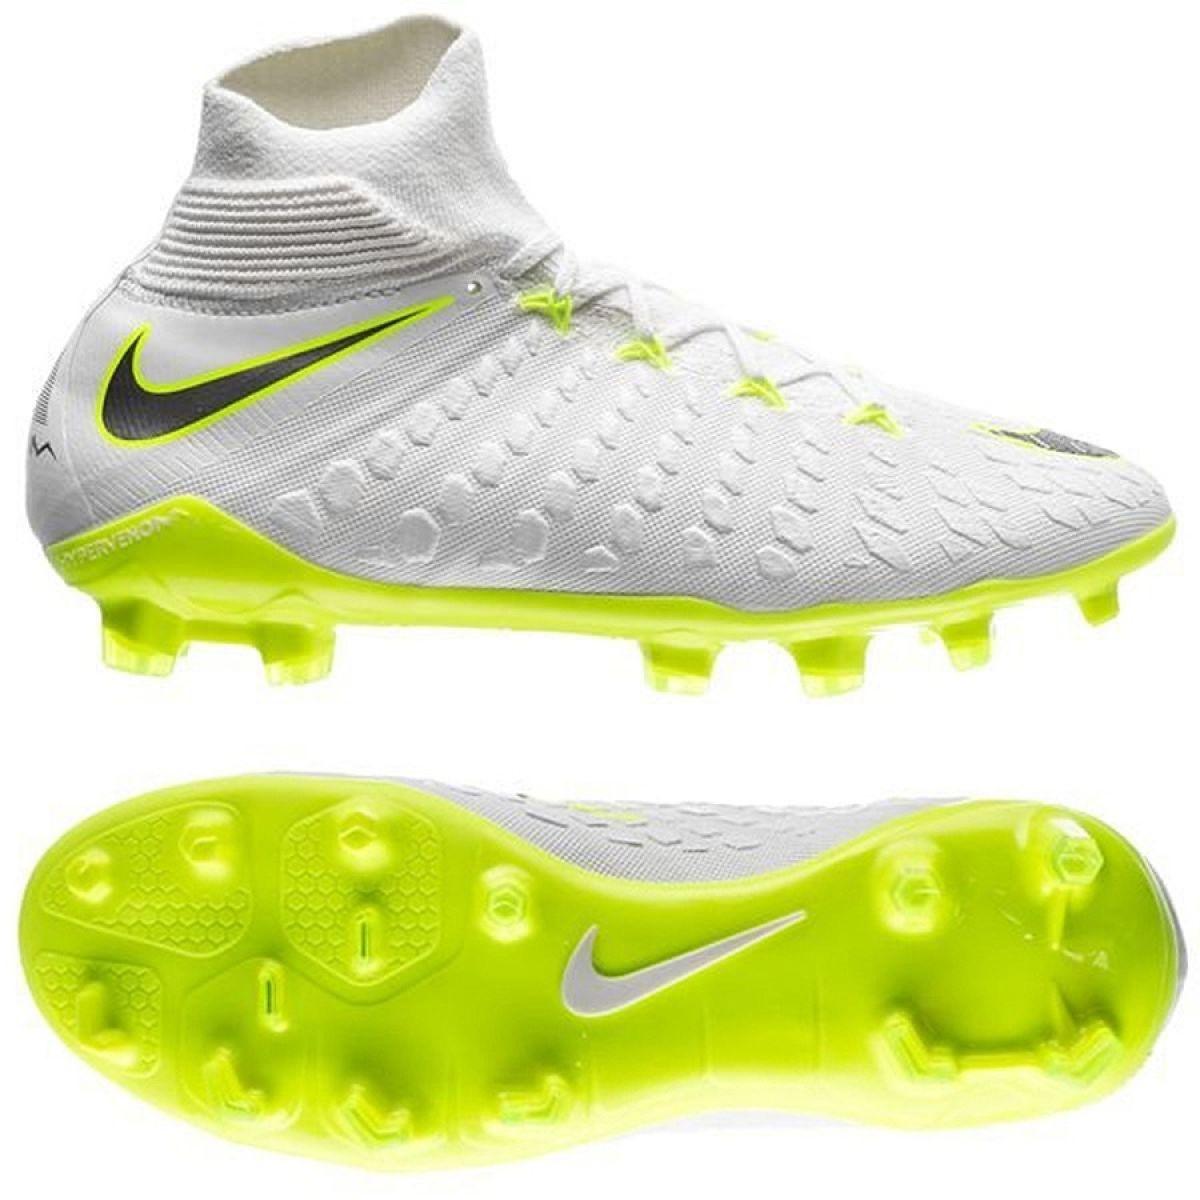 a99d179a4 Football Shoes Nike Hypervenom Phantom 3 Elite Dynamic Fit Fg Jr AJ3791-107